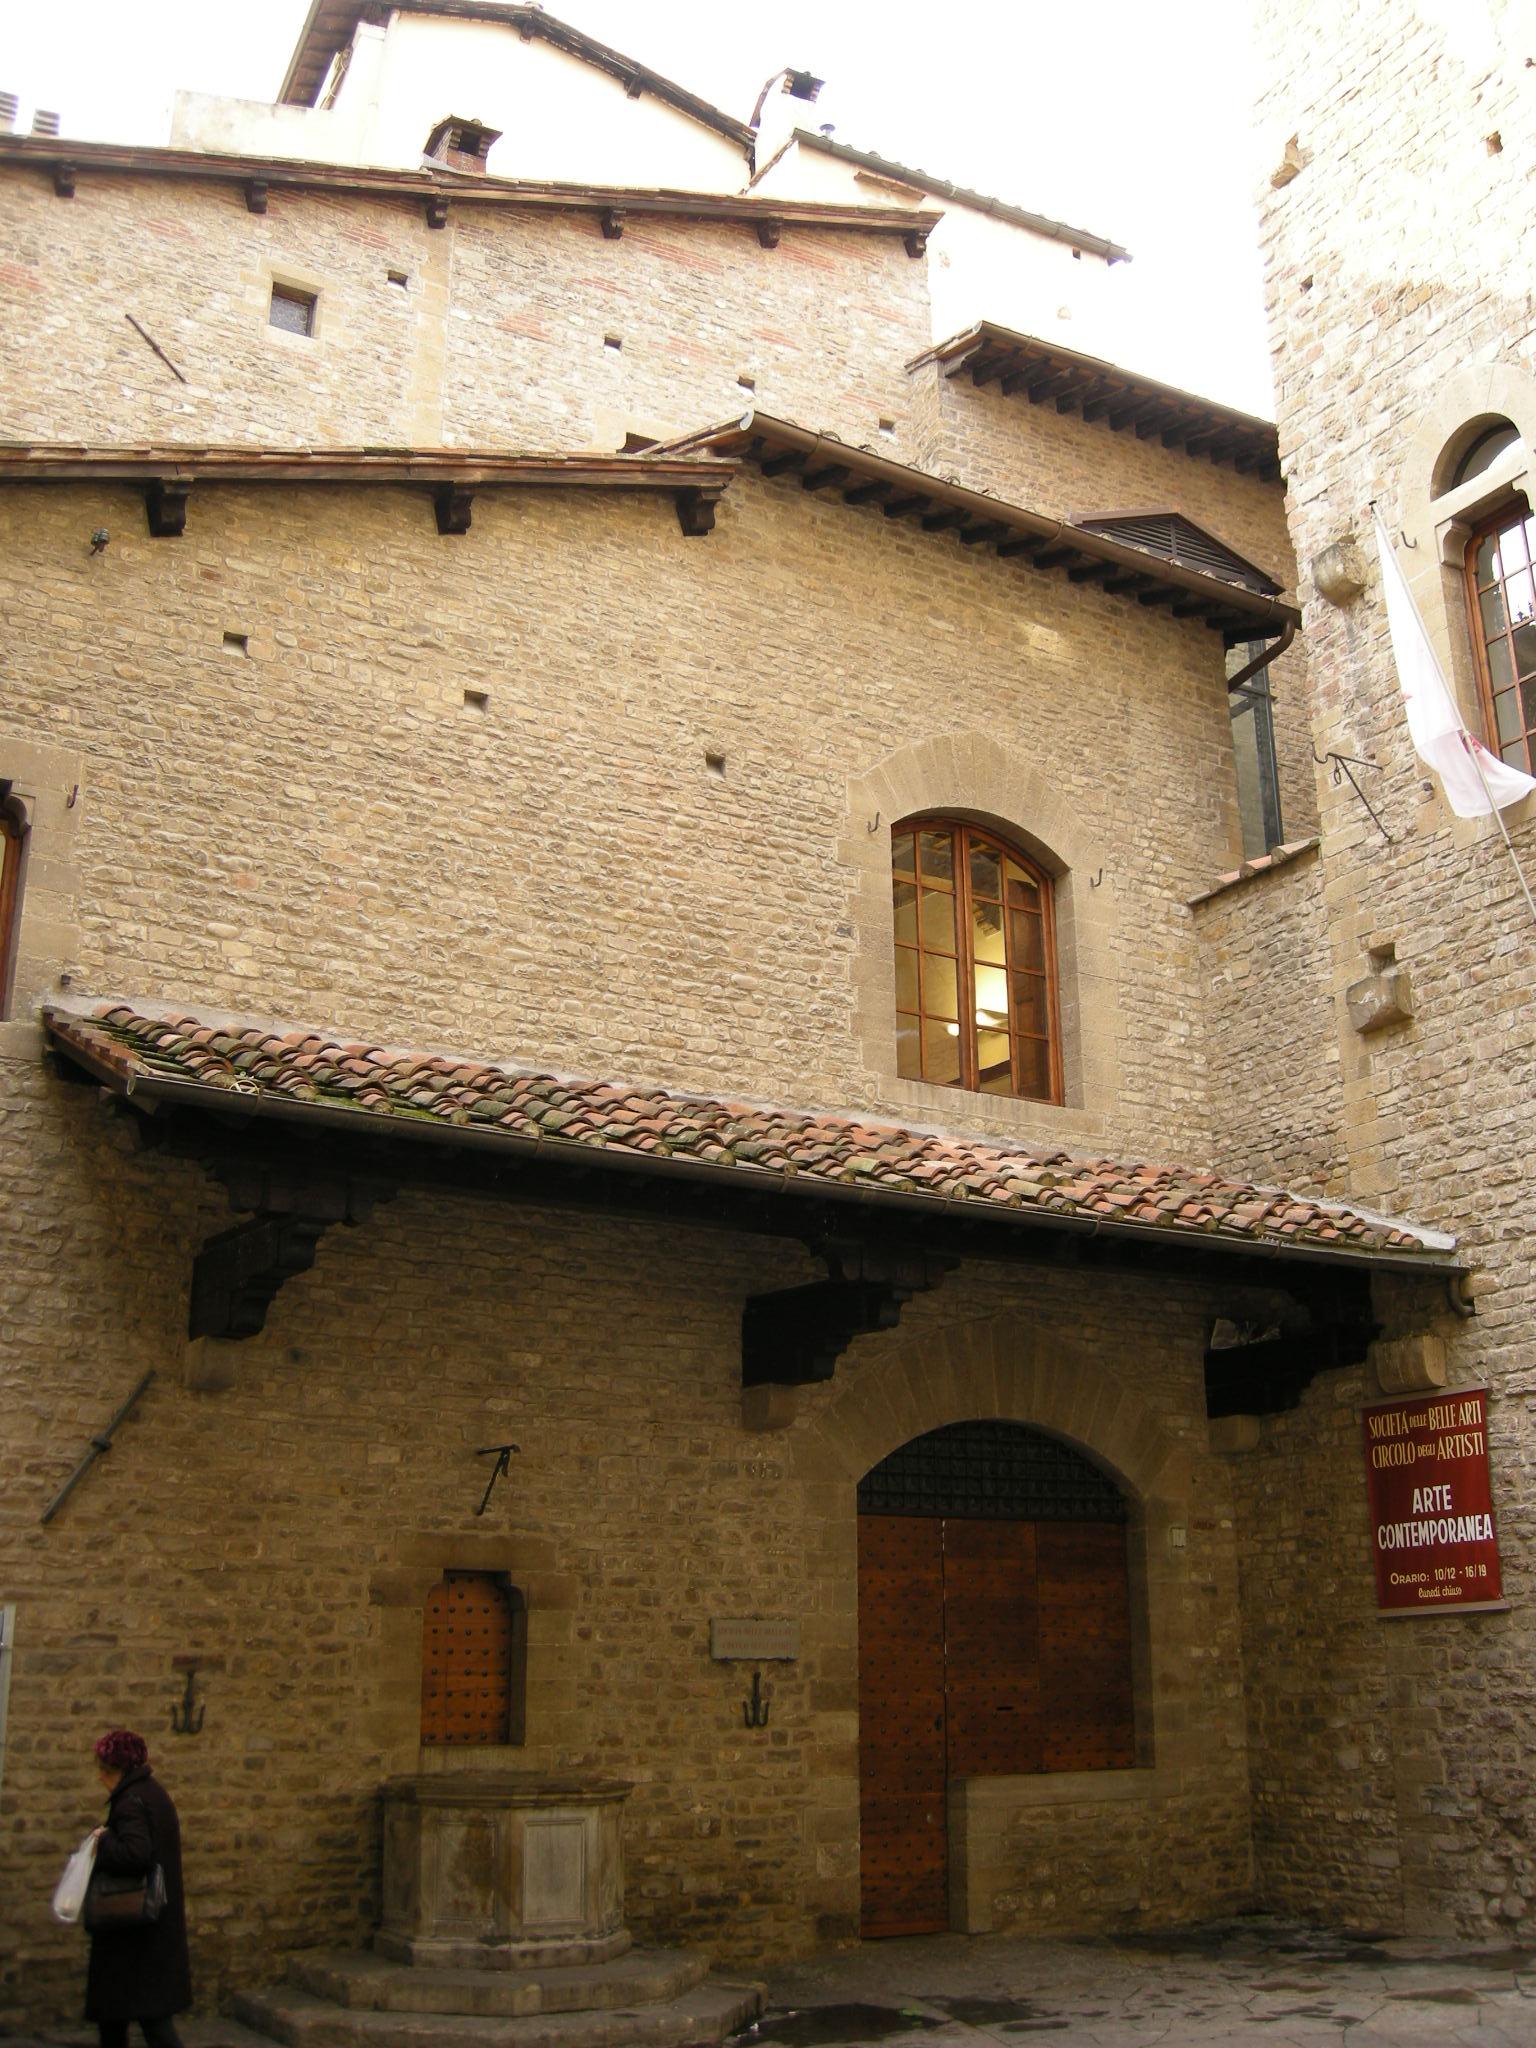 File:Casa di dante, ext 01 JPG - Wikimedia Commons